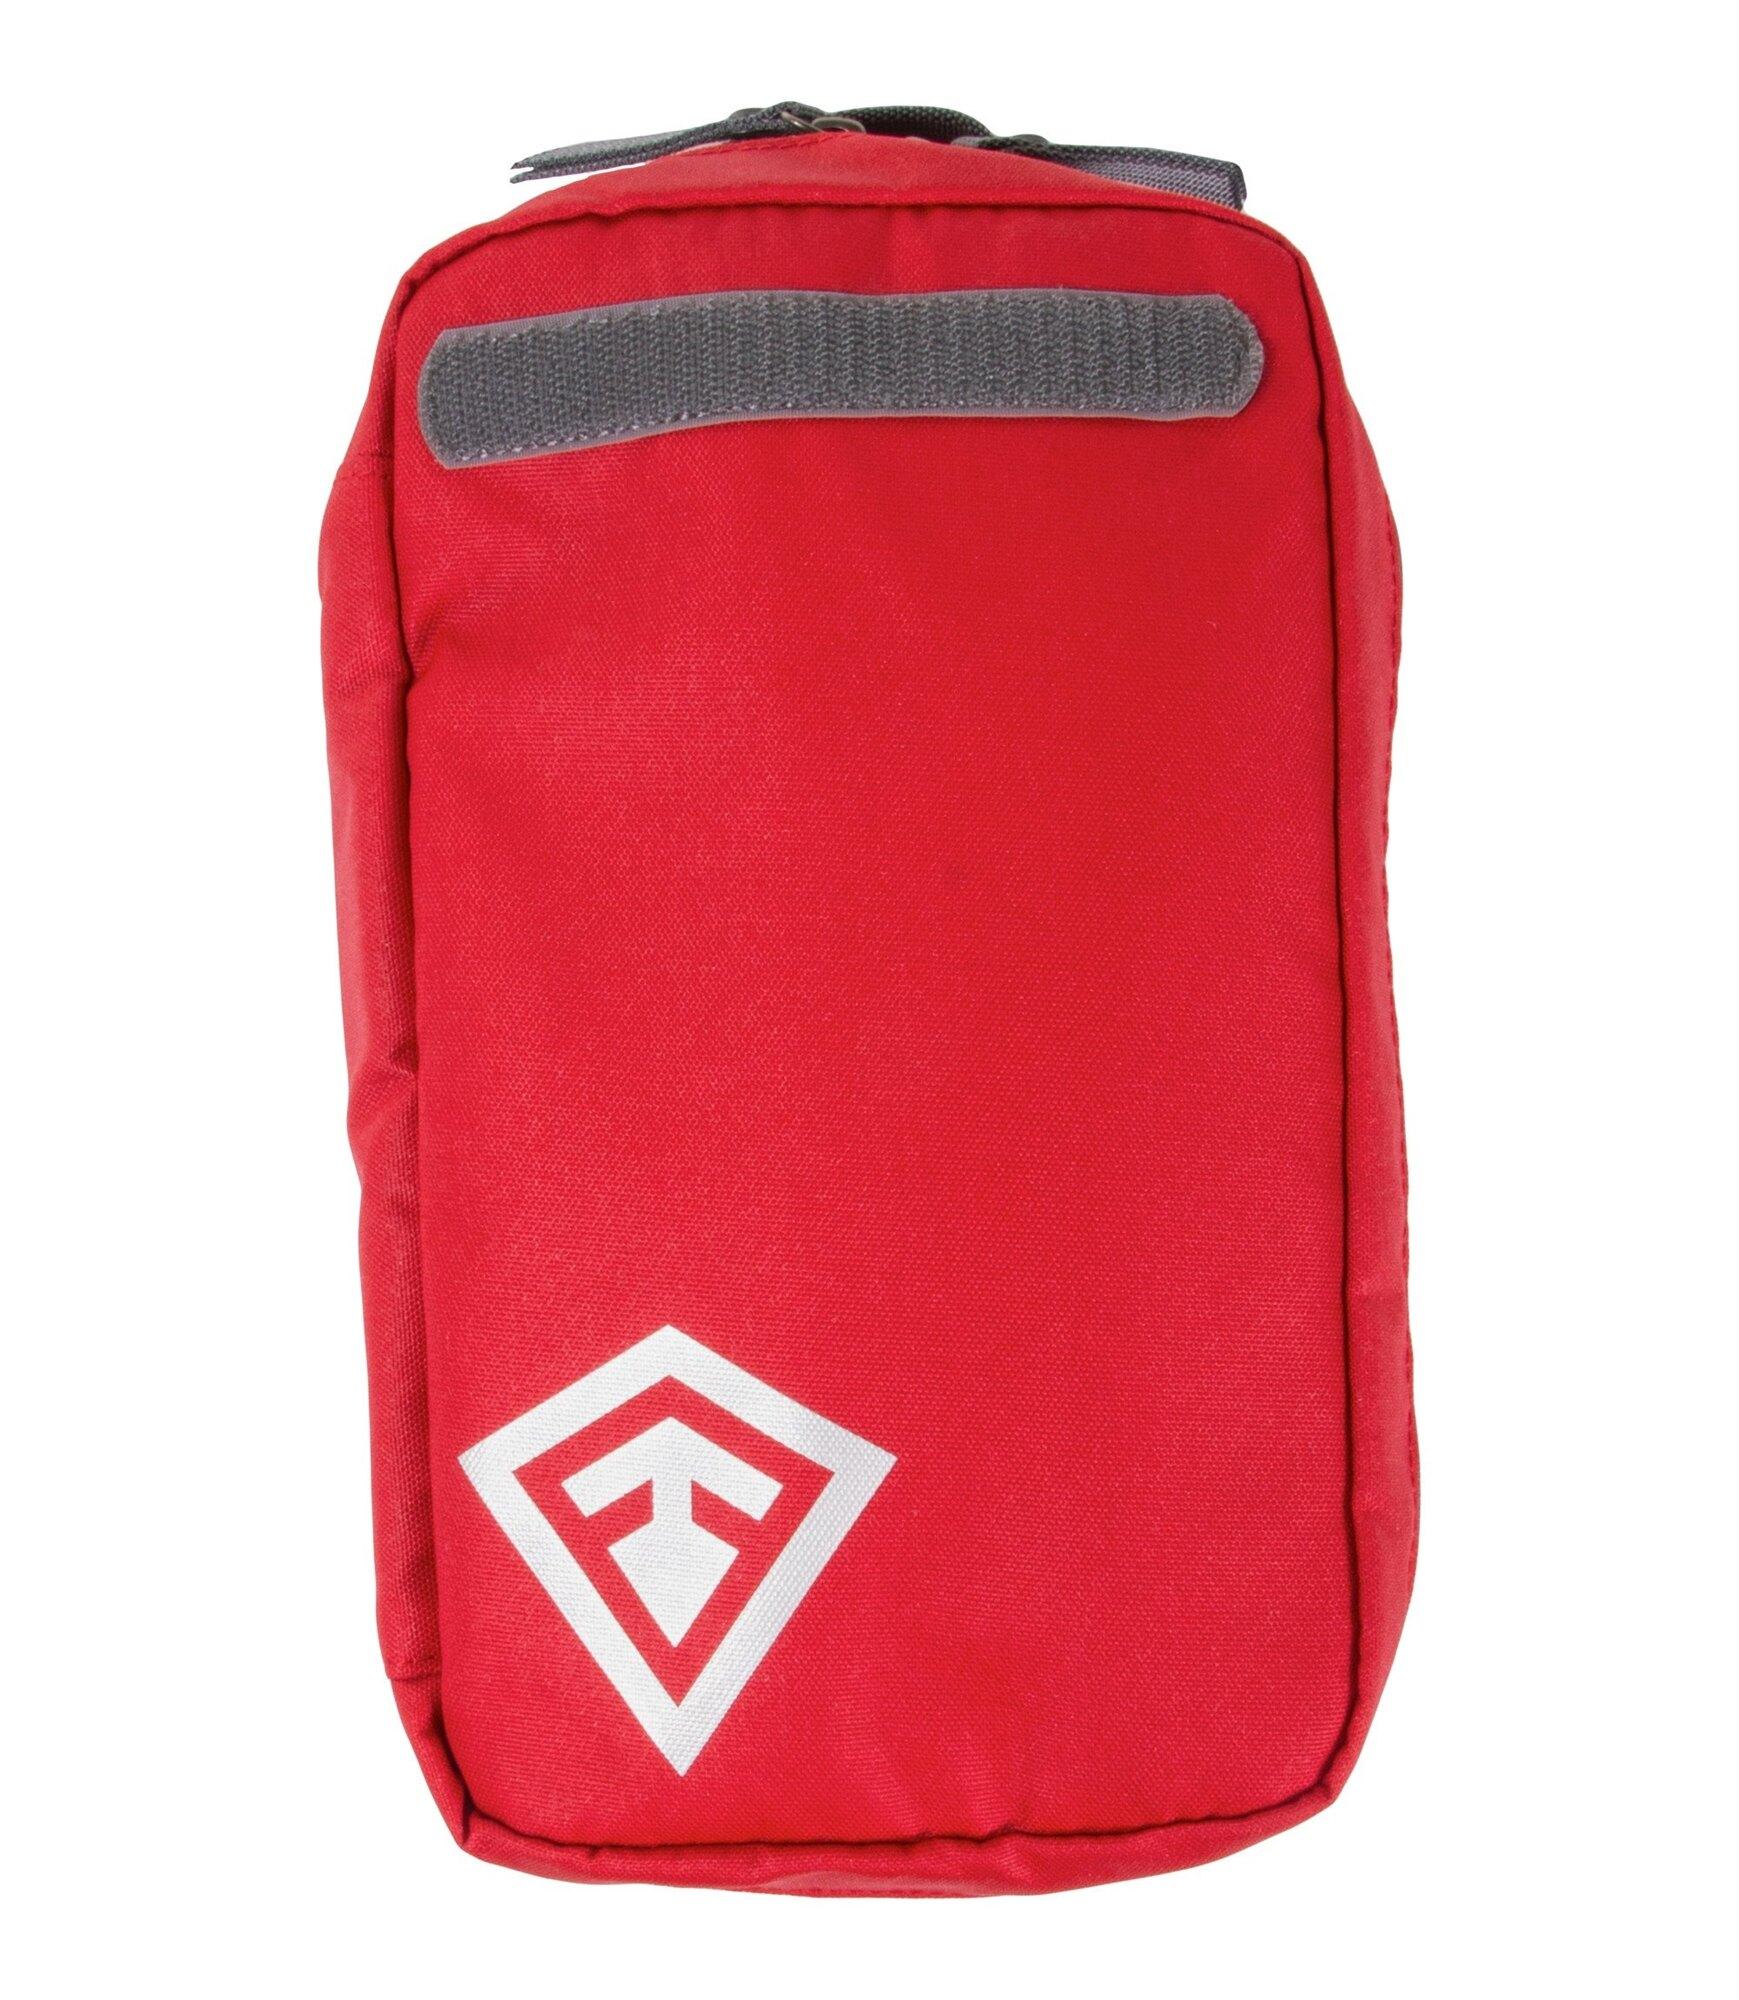 Puzdro I.V. Kit First Tactical® - červené